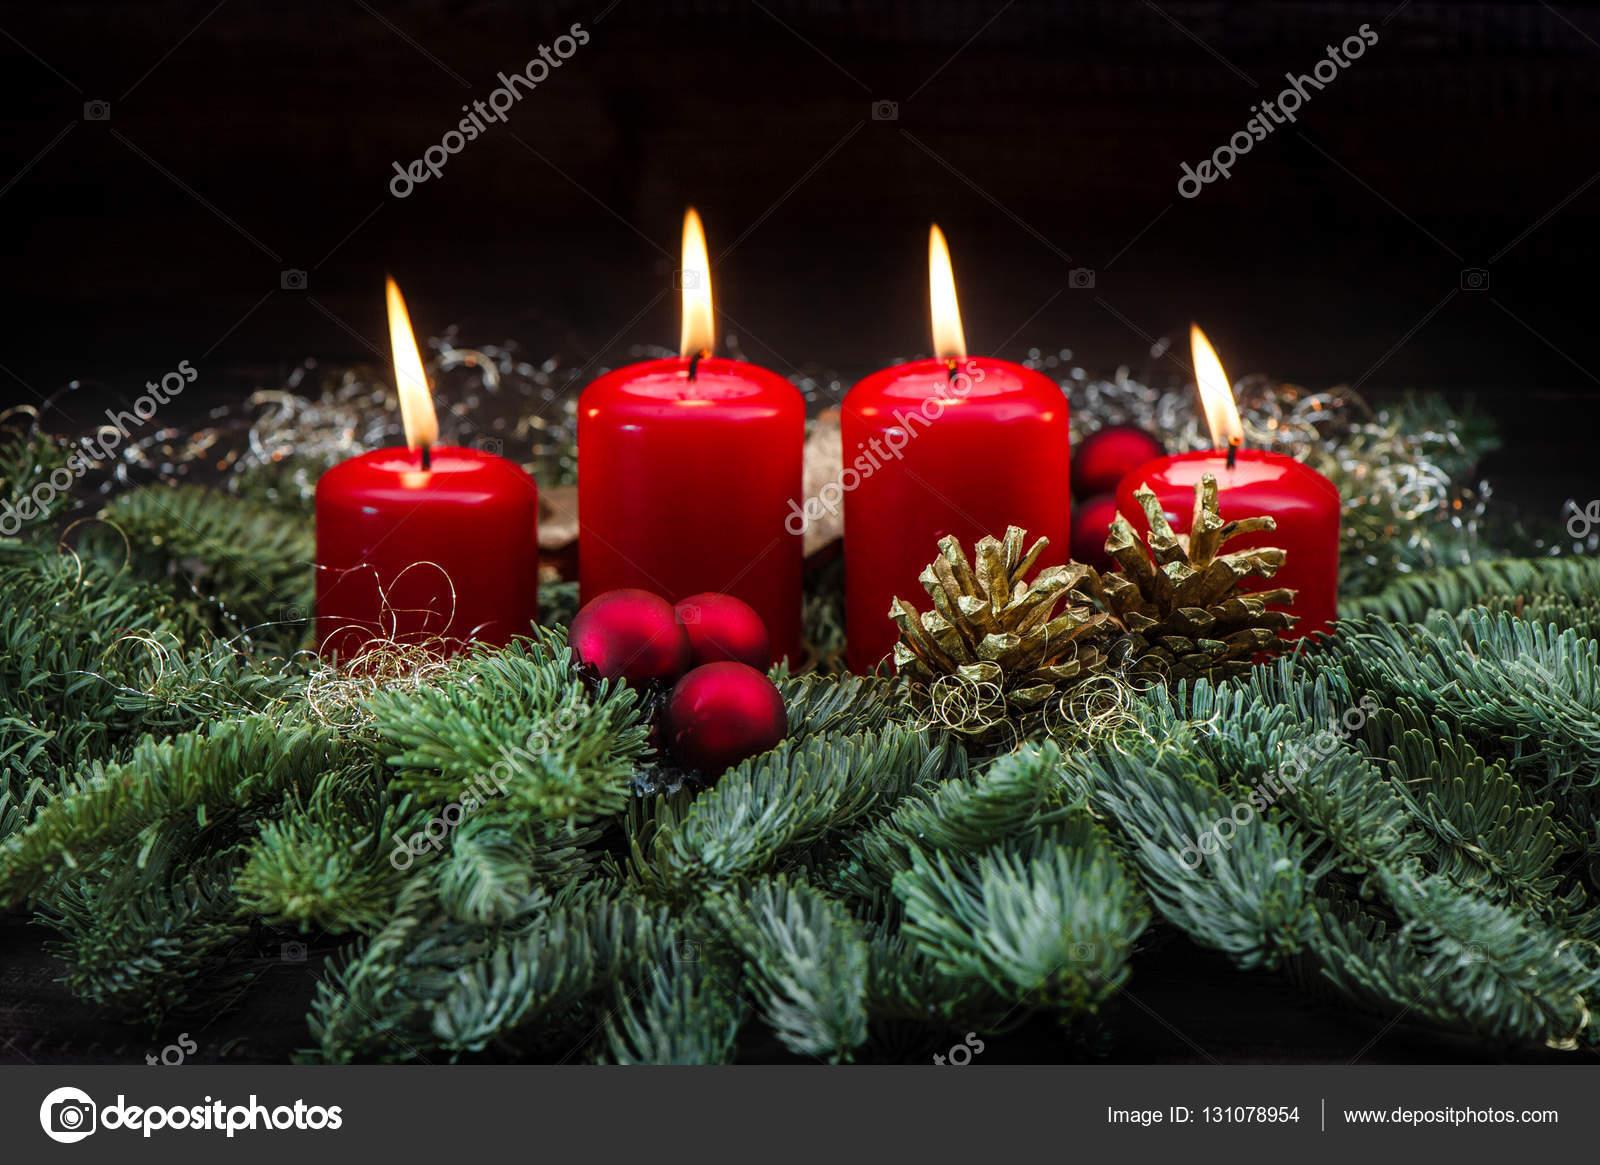 Advent dekoration r d brinnande ljus julgran grenar - Dekoration advent ...